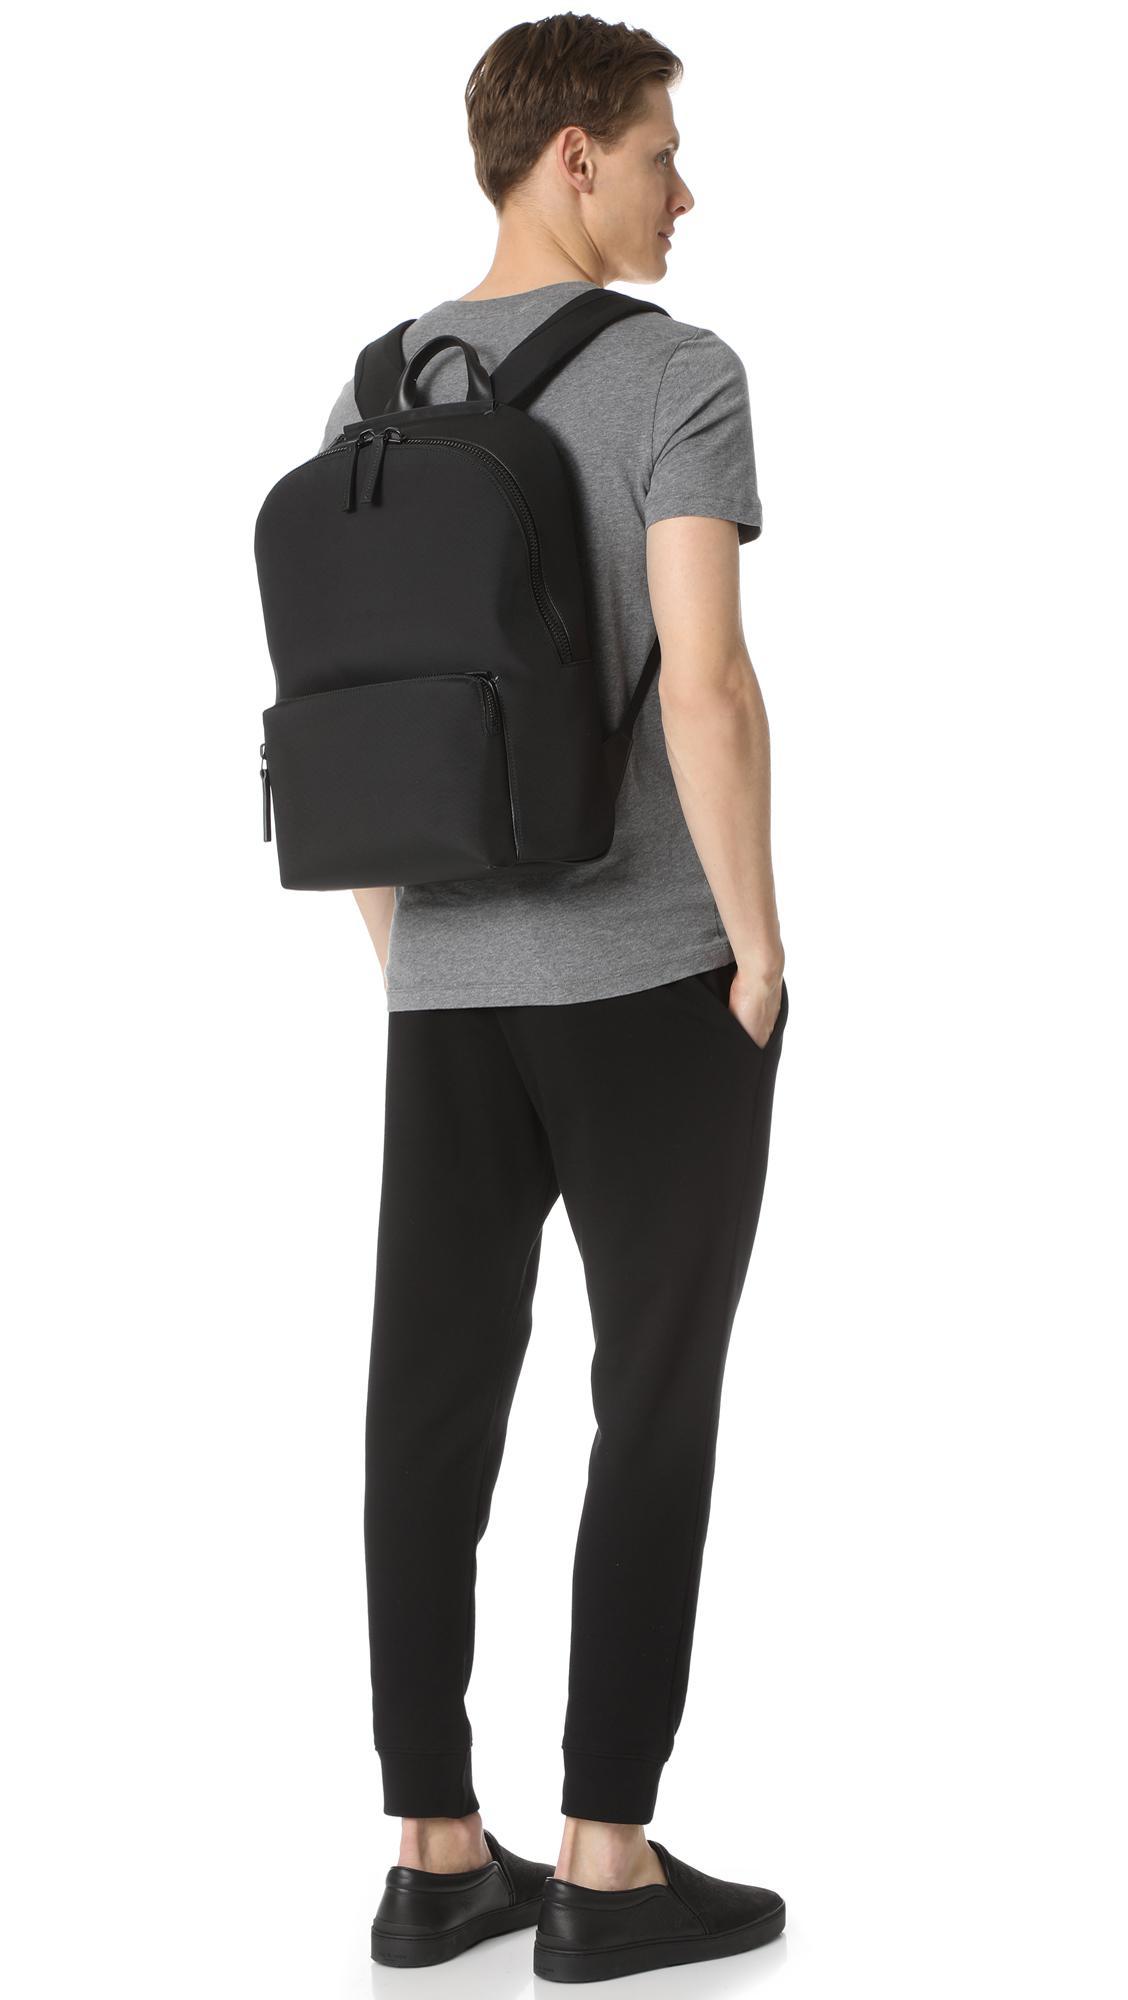 d8e35dfd7 Troubadour Zip Top Rucksack in Black for Men - Lyst